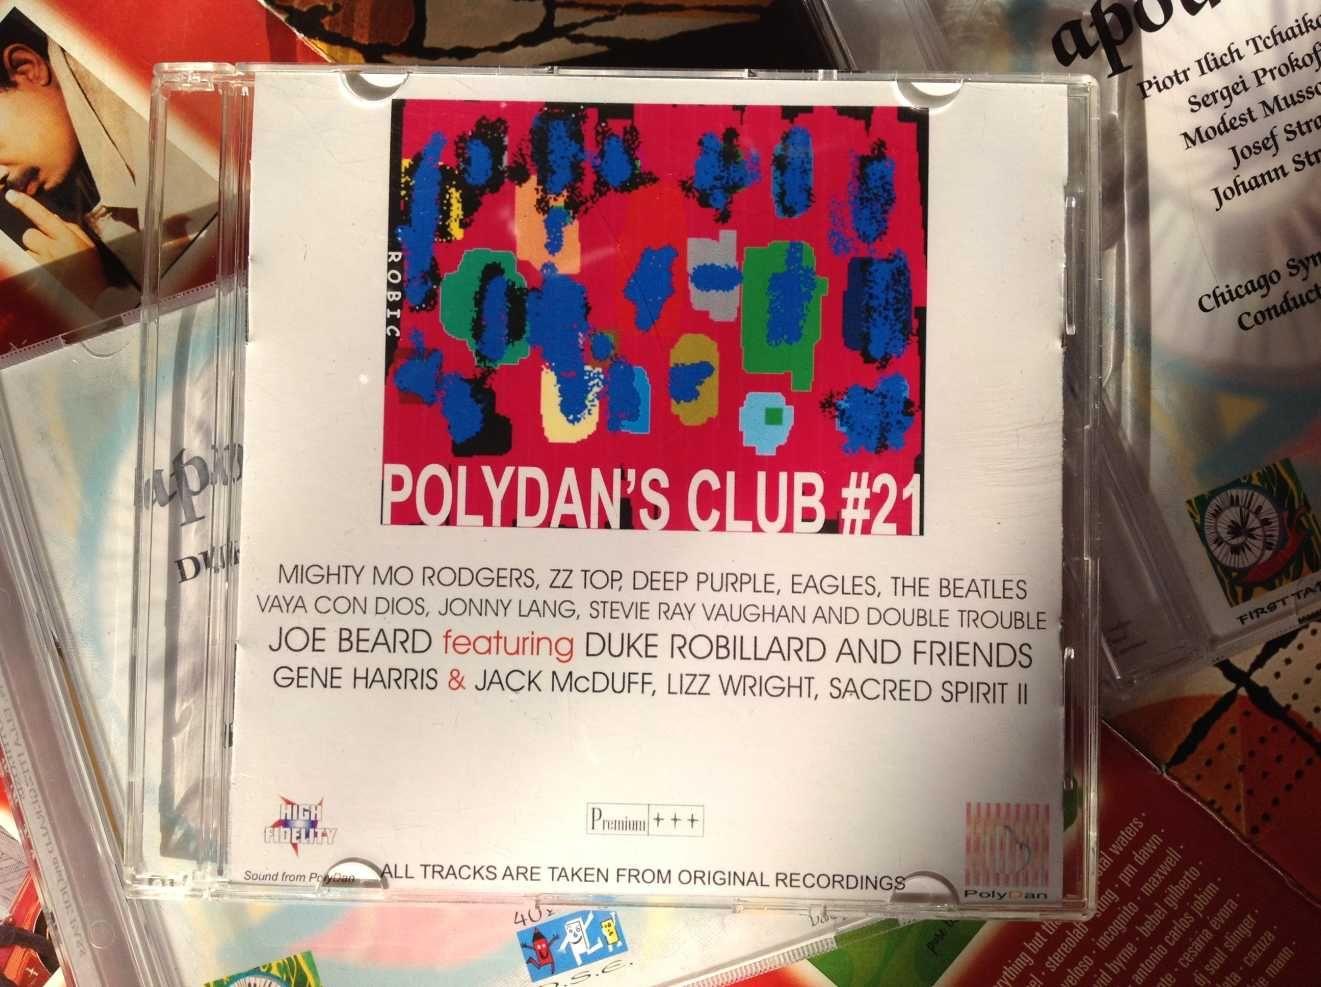 Robert Danelyan Showcase High End Series Polydan Sound Laboratory Gladkikh Inga Ok Soon Gold Psl Dse Music Program Musi In 2020 Club Sound Program Hi End